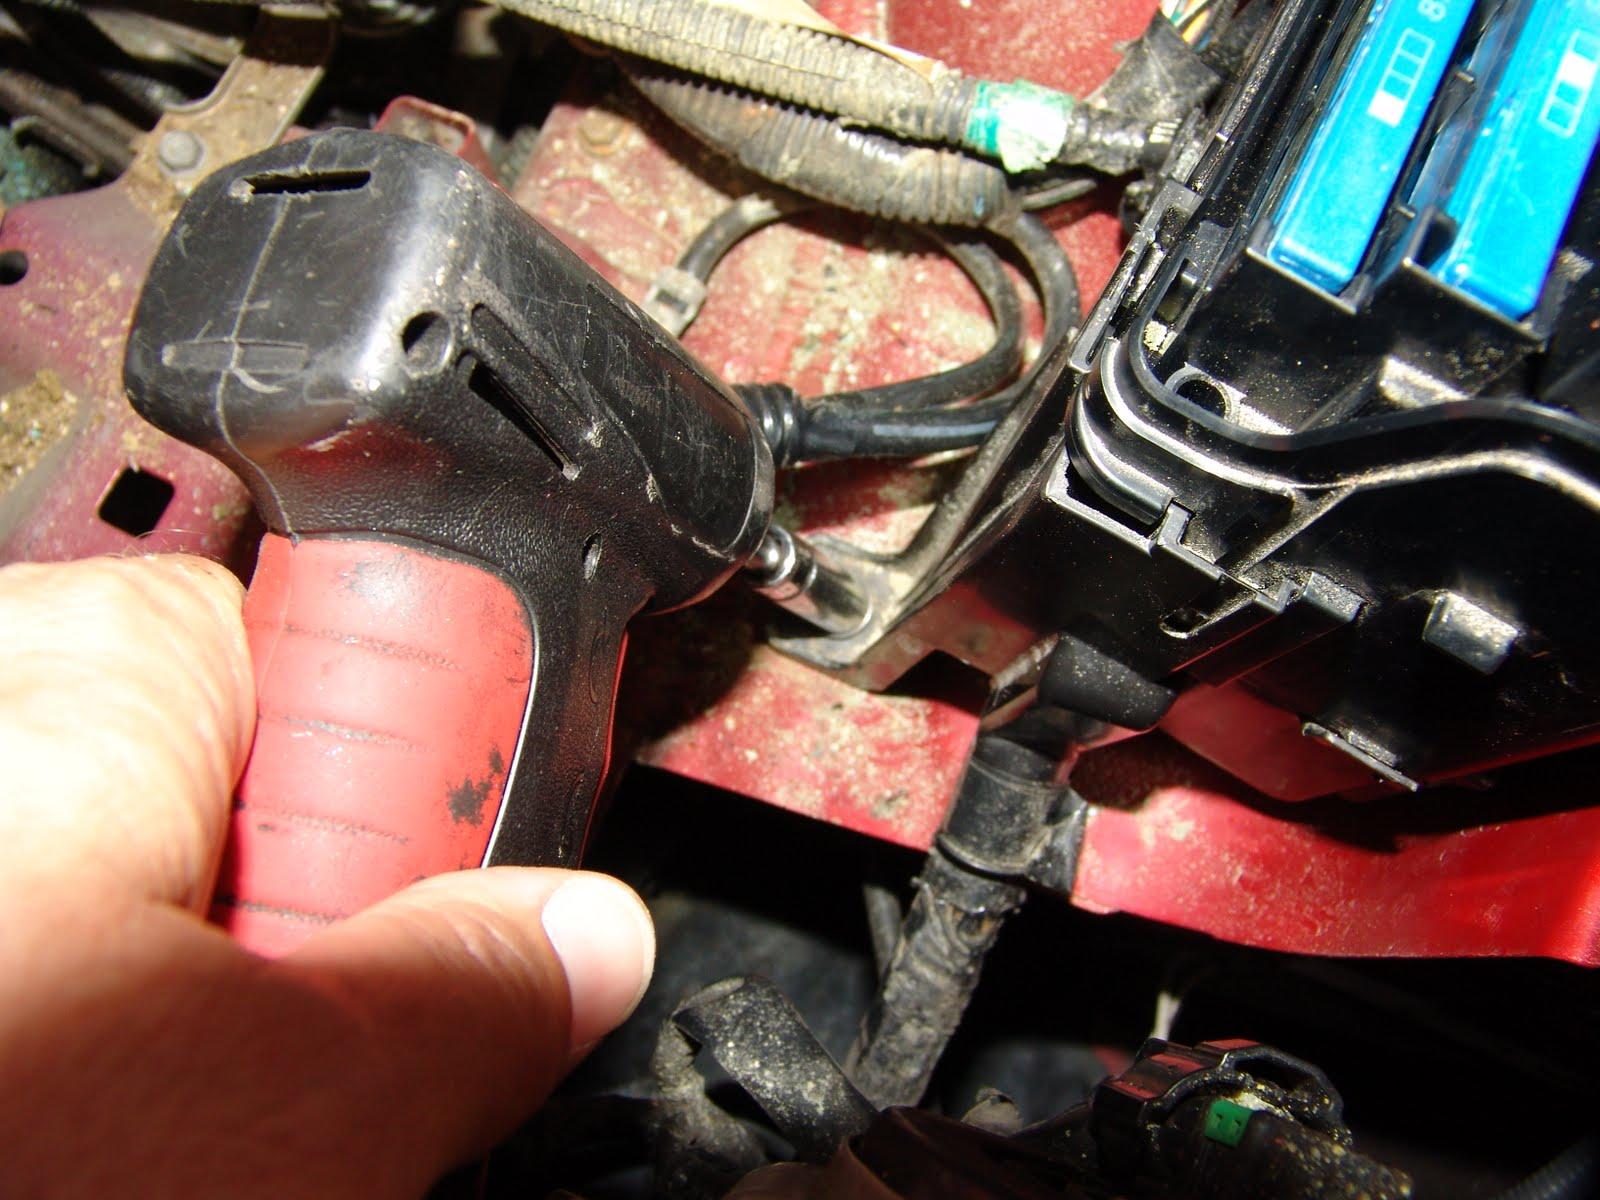 2000 sunfire how to take off a alternator